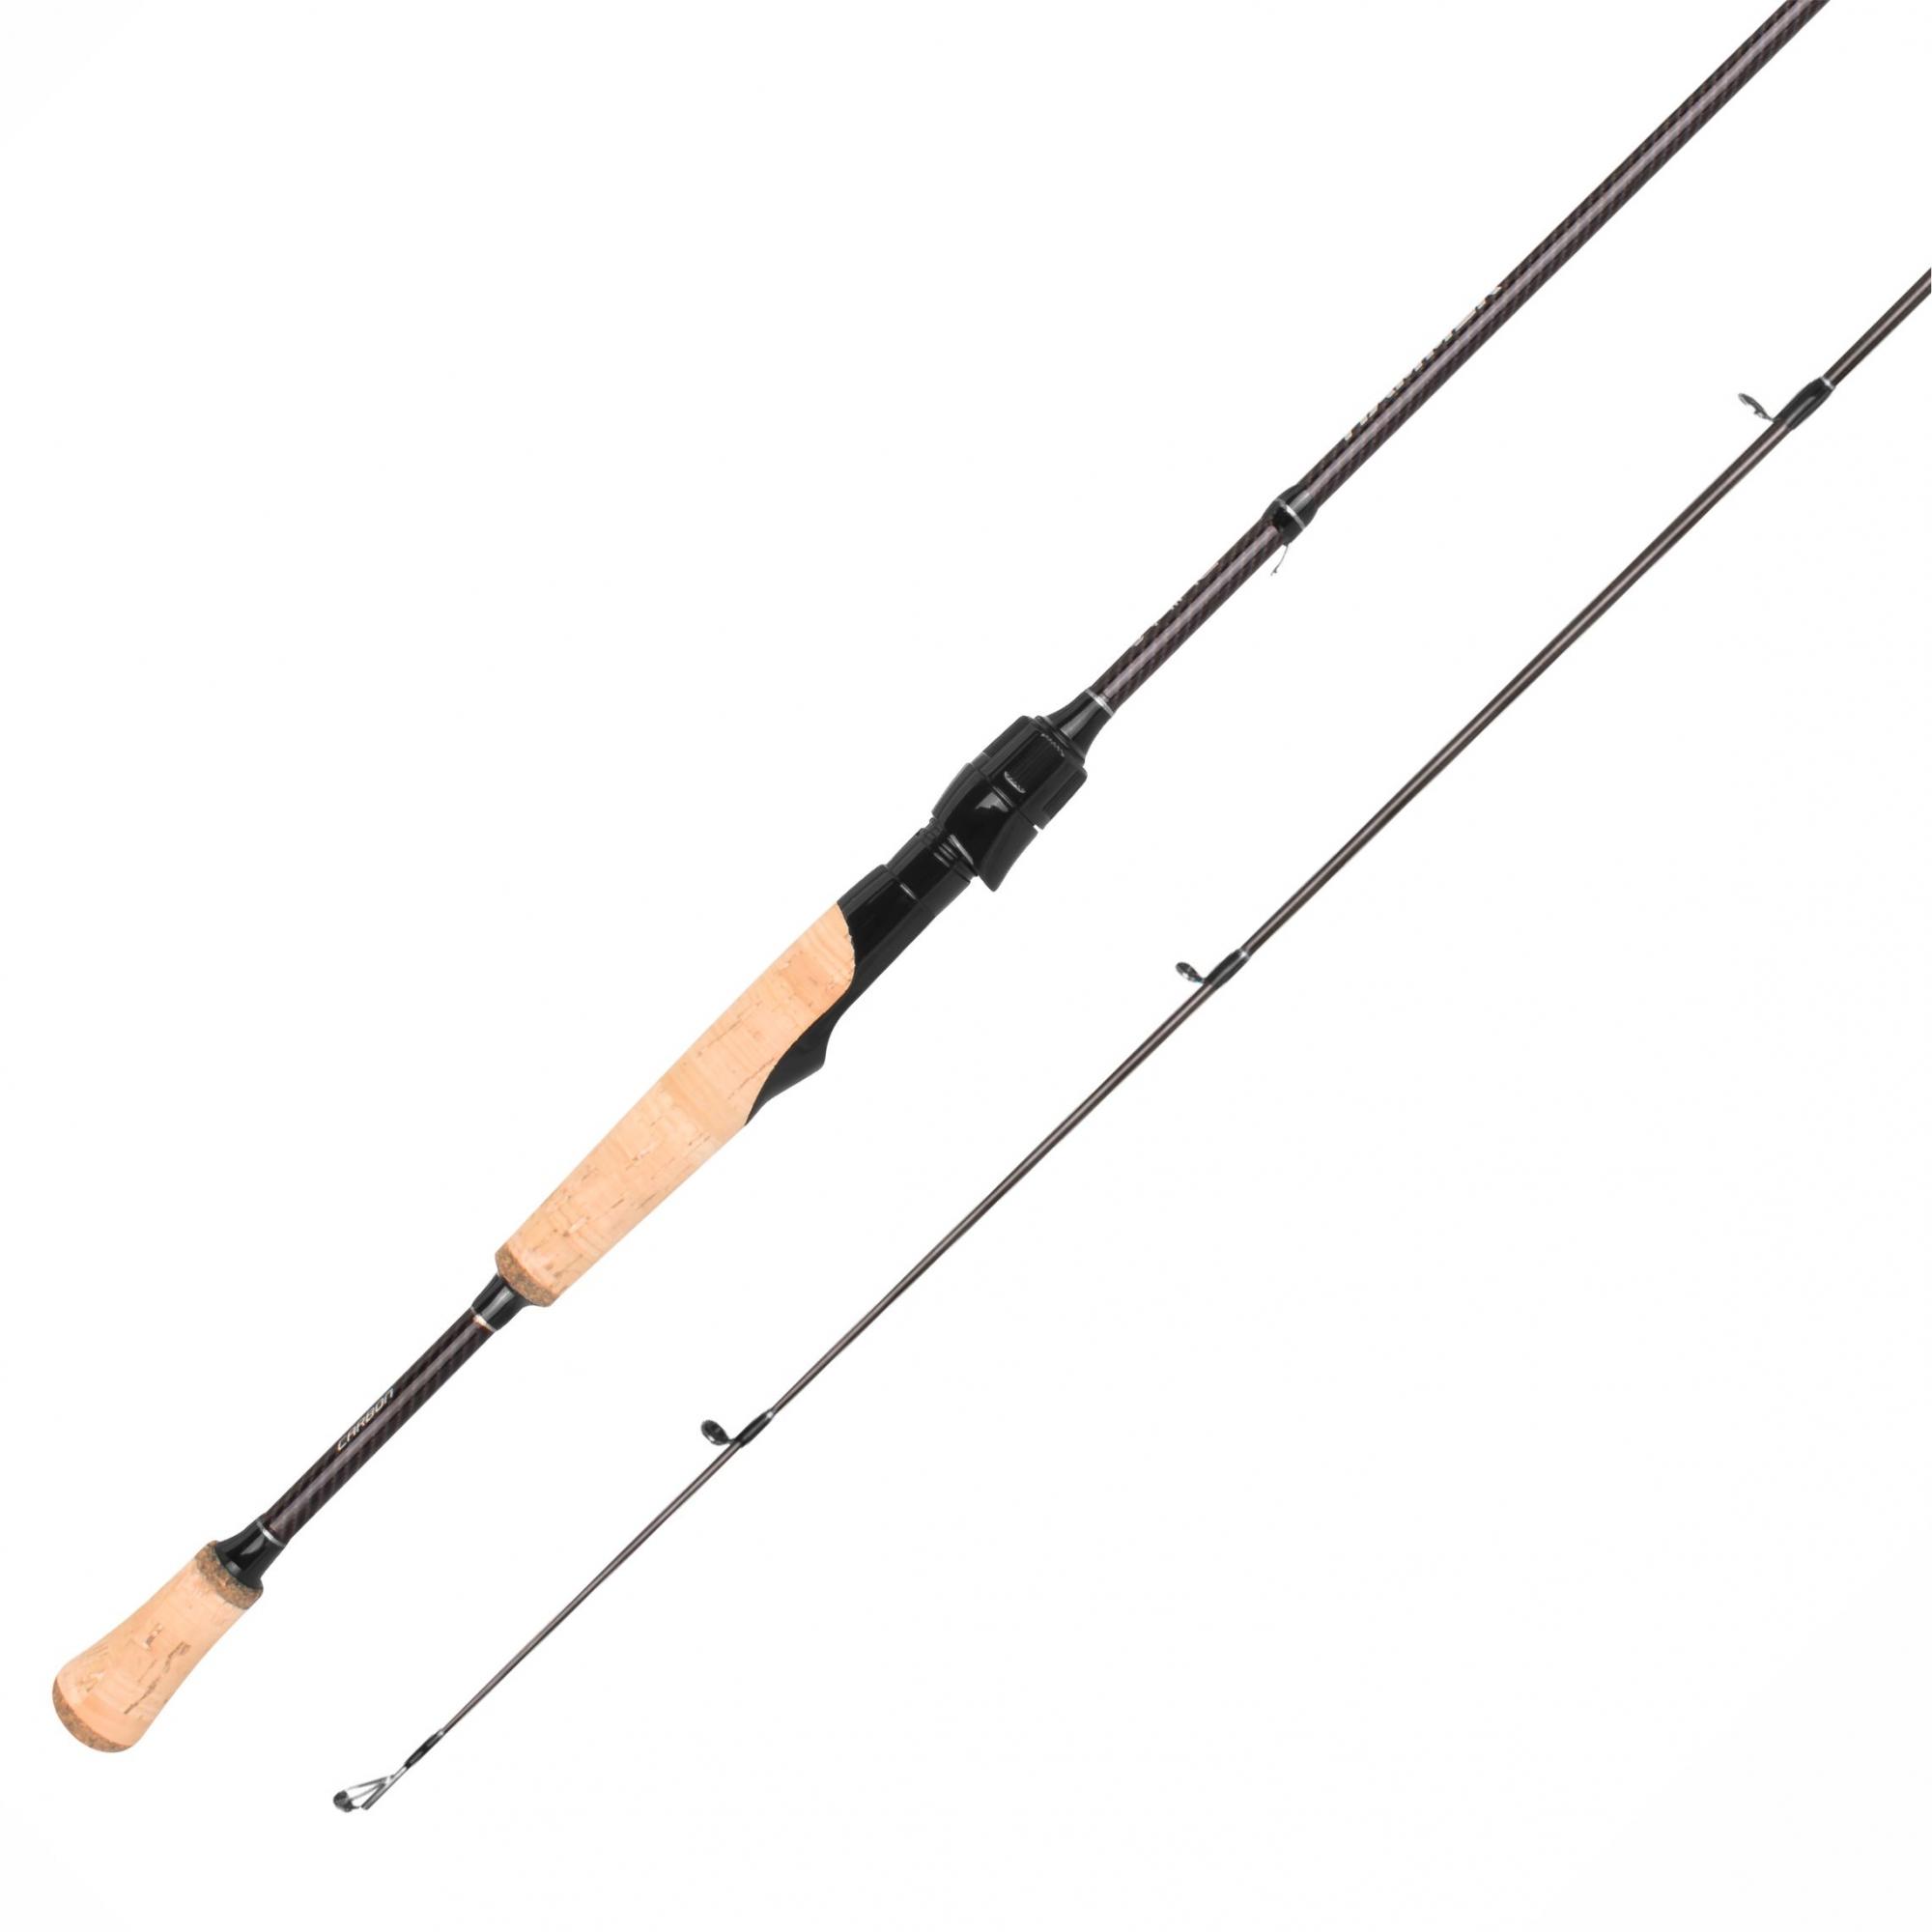 Vara Saint Hammer 581 1,73m 6-14LB p/ Molinete  - Pesca Adventure